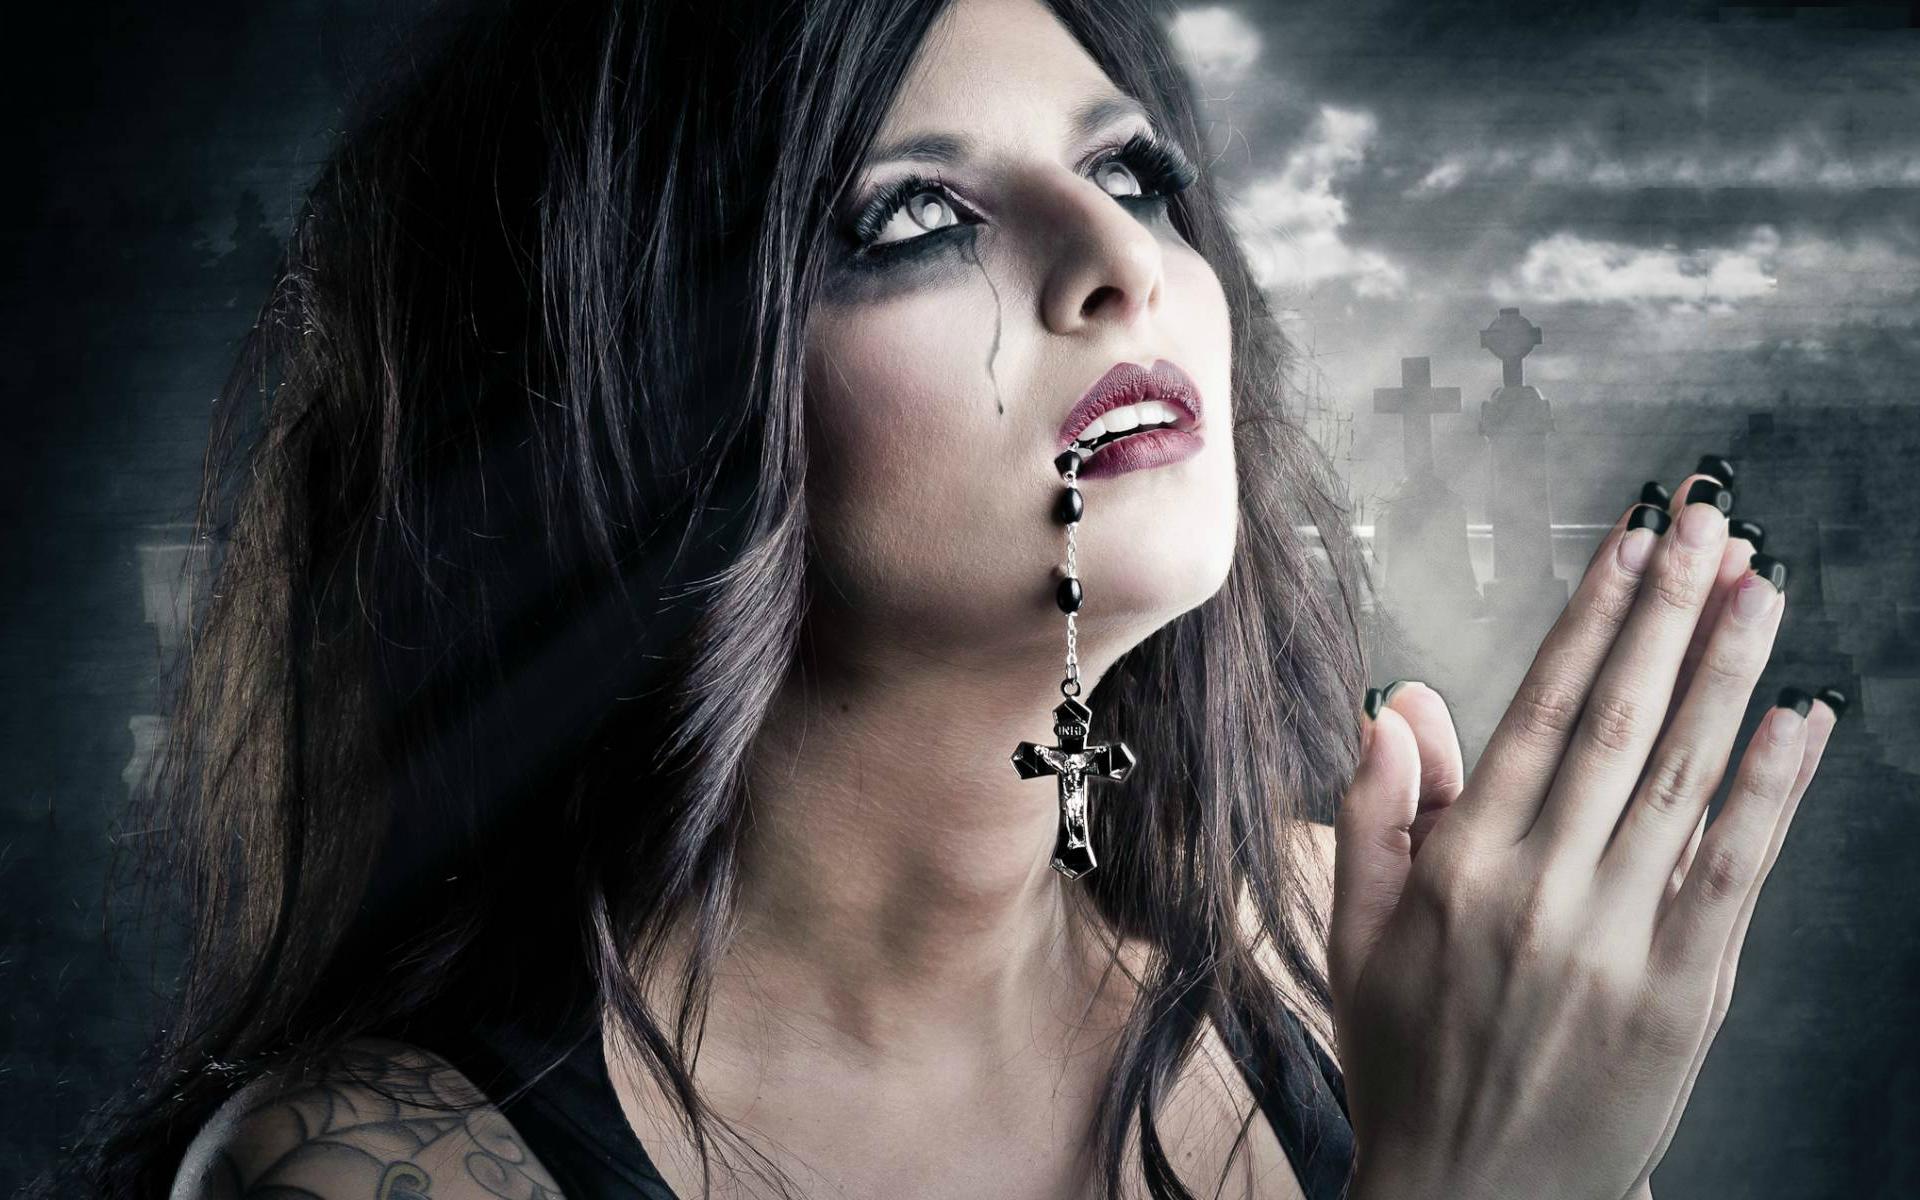 Wallpaper : women, model, black hair, fashion, Gothic ...